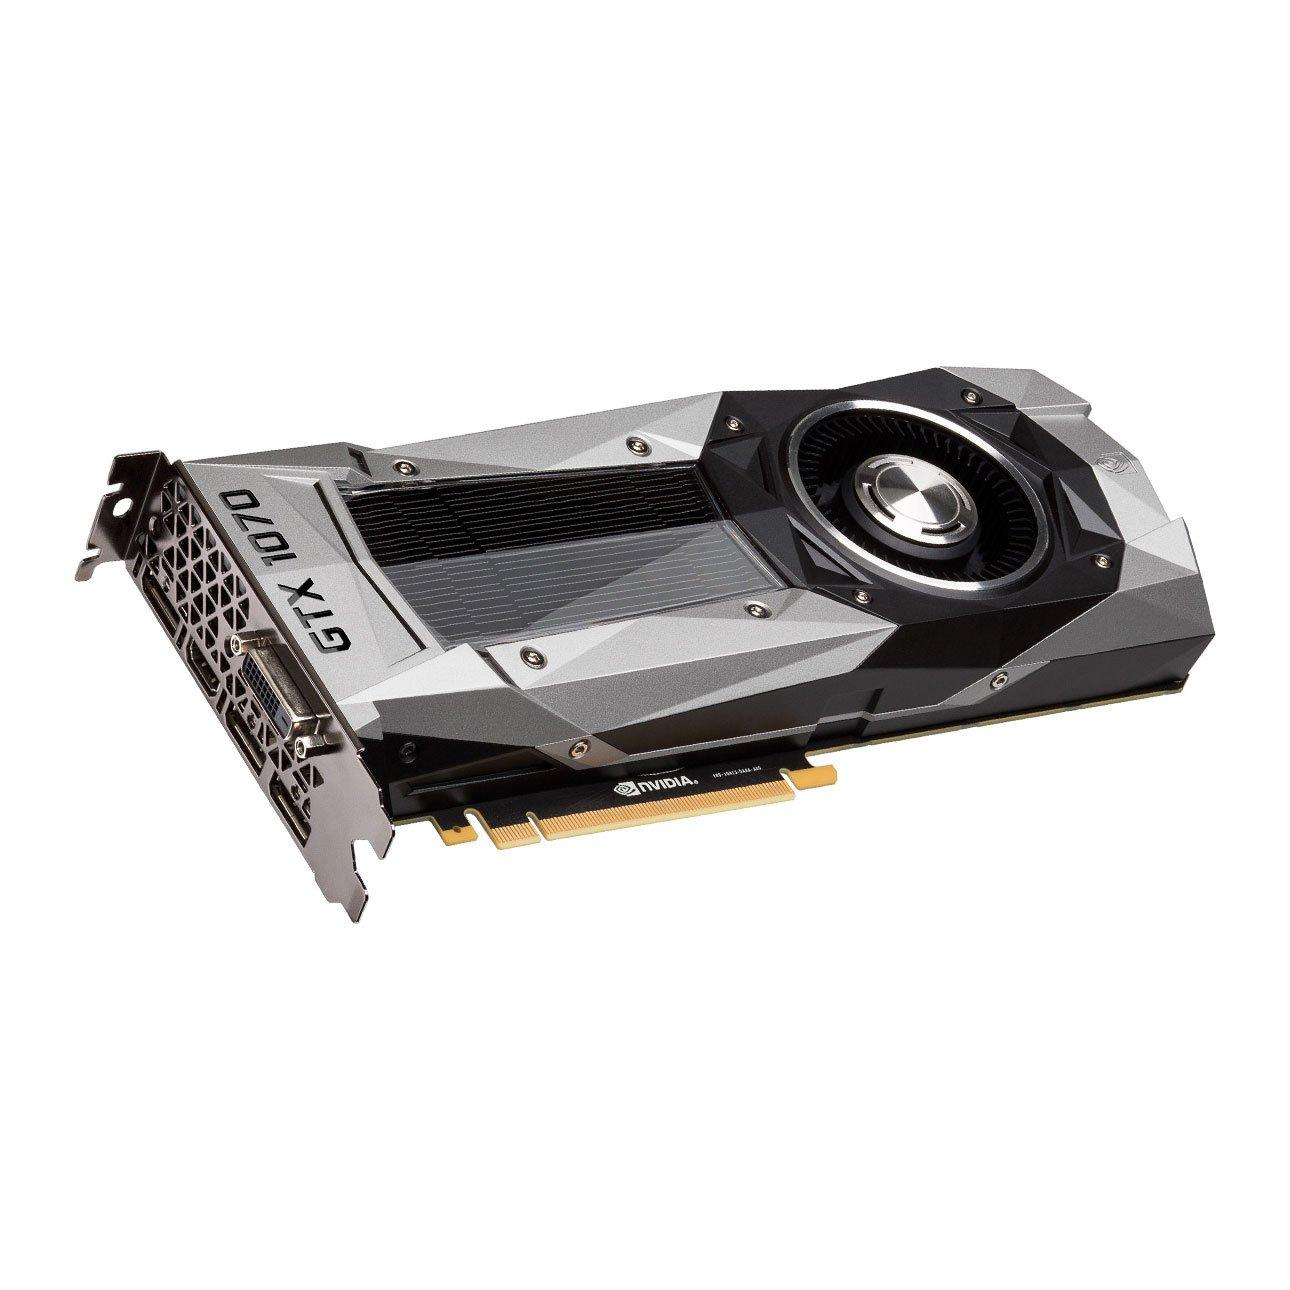 EVGA Nvidia GTX 1070 Founders Edition 8Gb GDDR5 1683mhz Boost, 1506Mhz Base, DP, HDMI, DL DVI PCI E Tarjeta gráfica